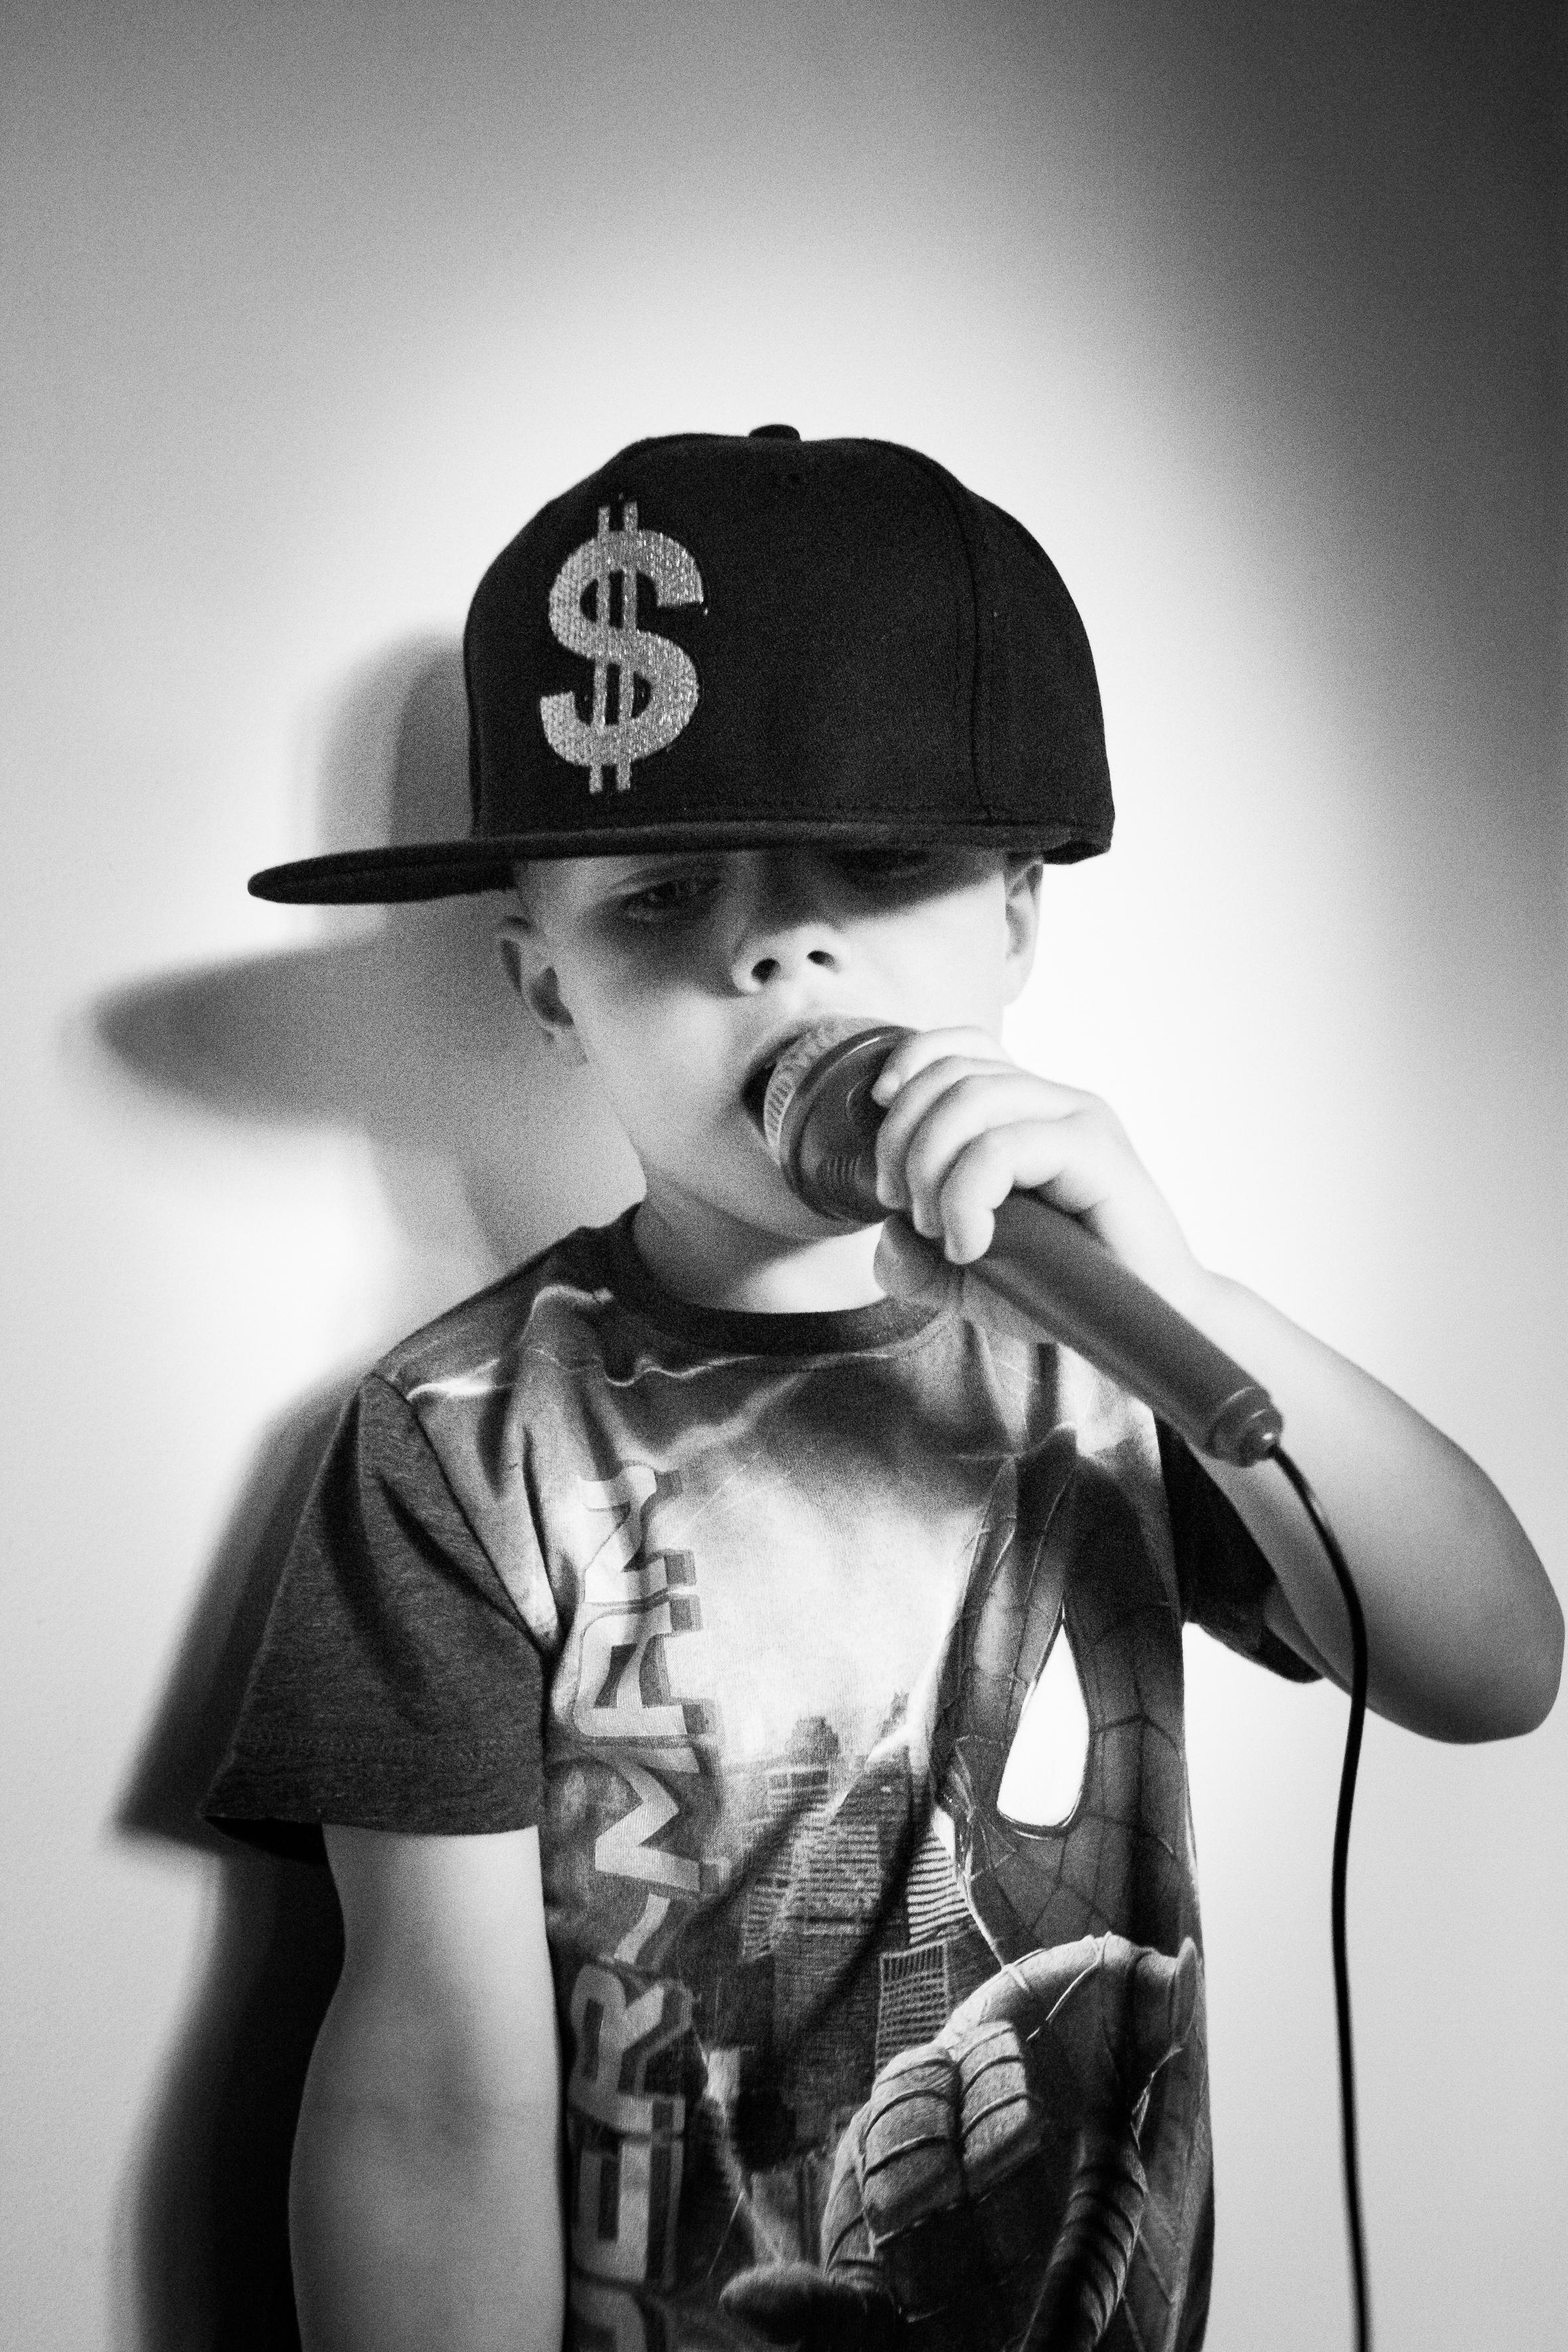 hip hop boy copyrights myphotopie